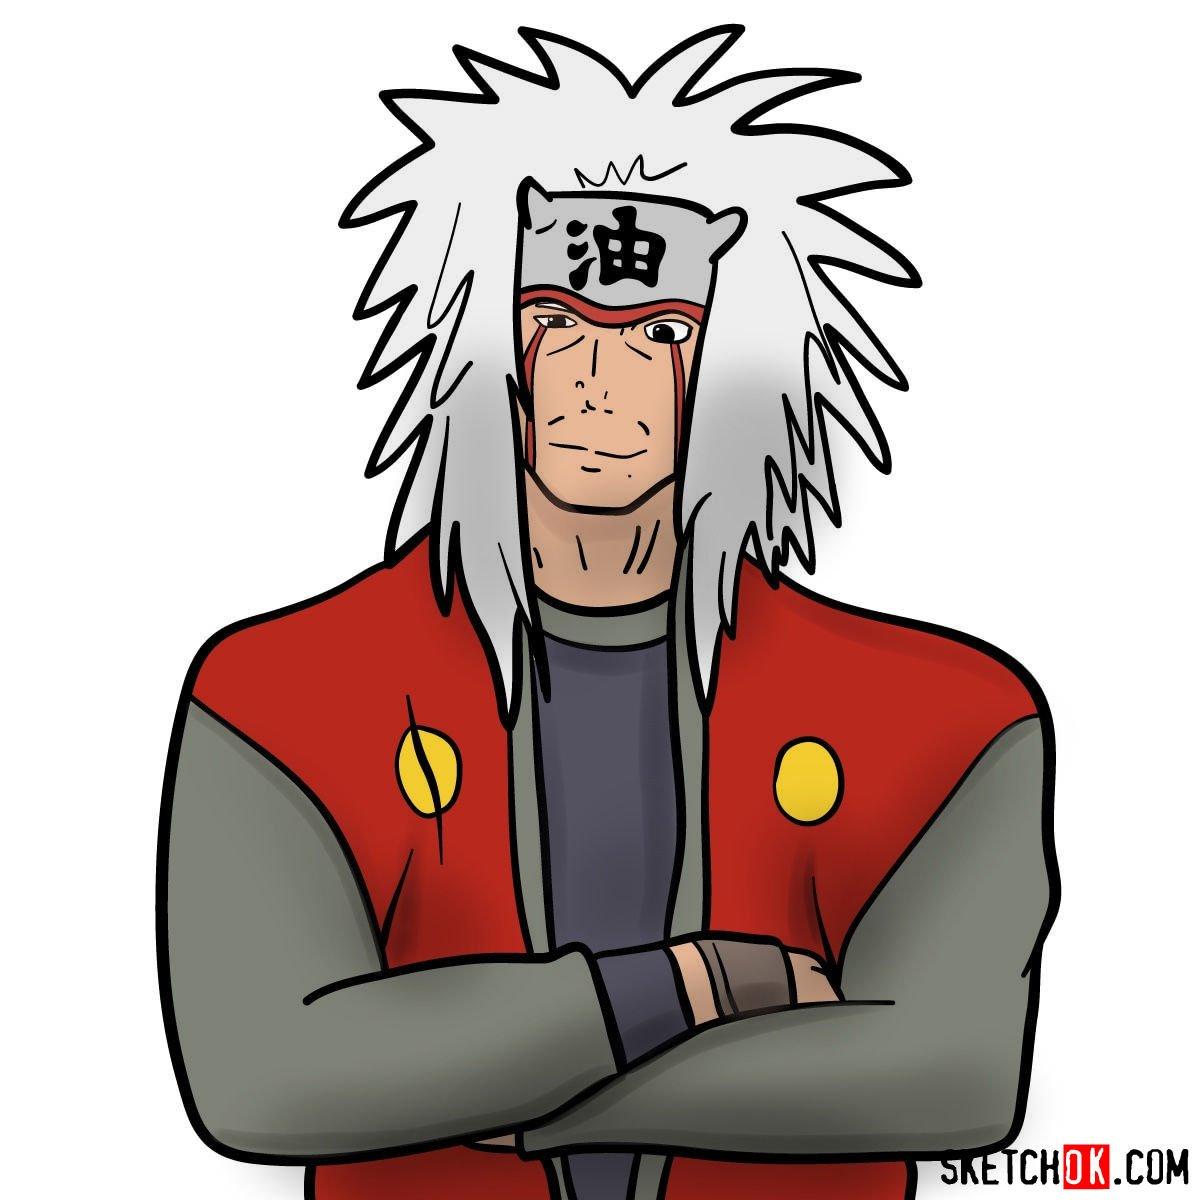 How to draw Jiraiya from Naruto anime